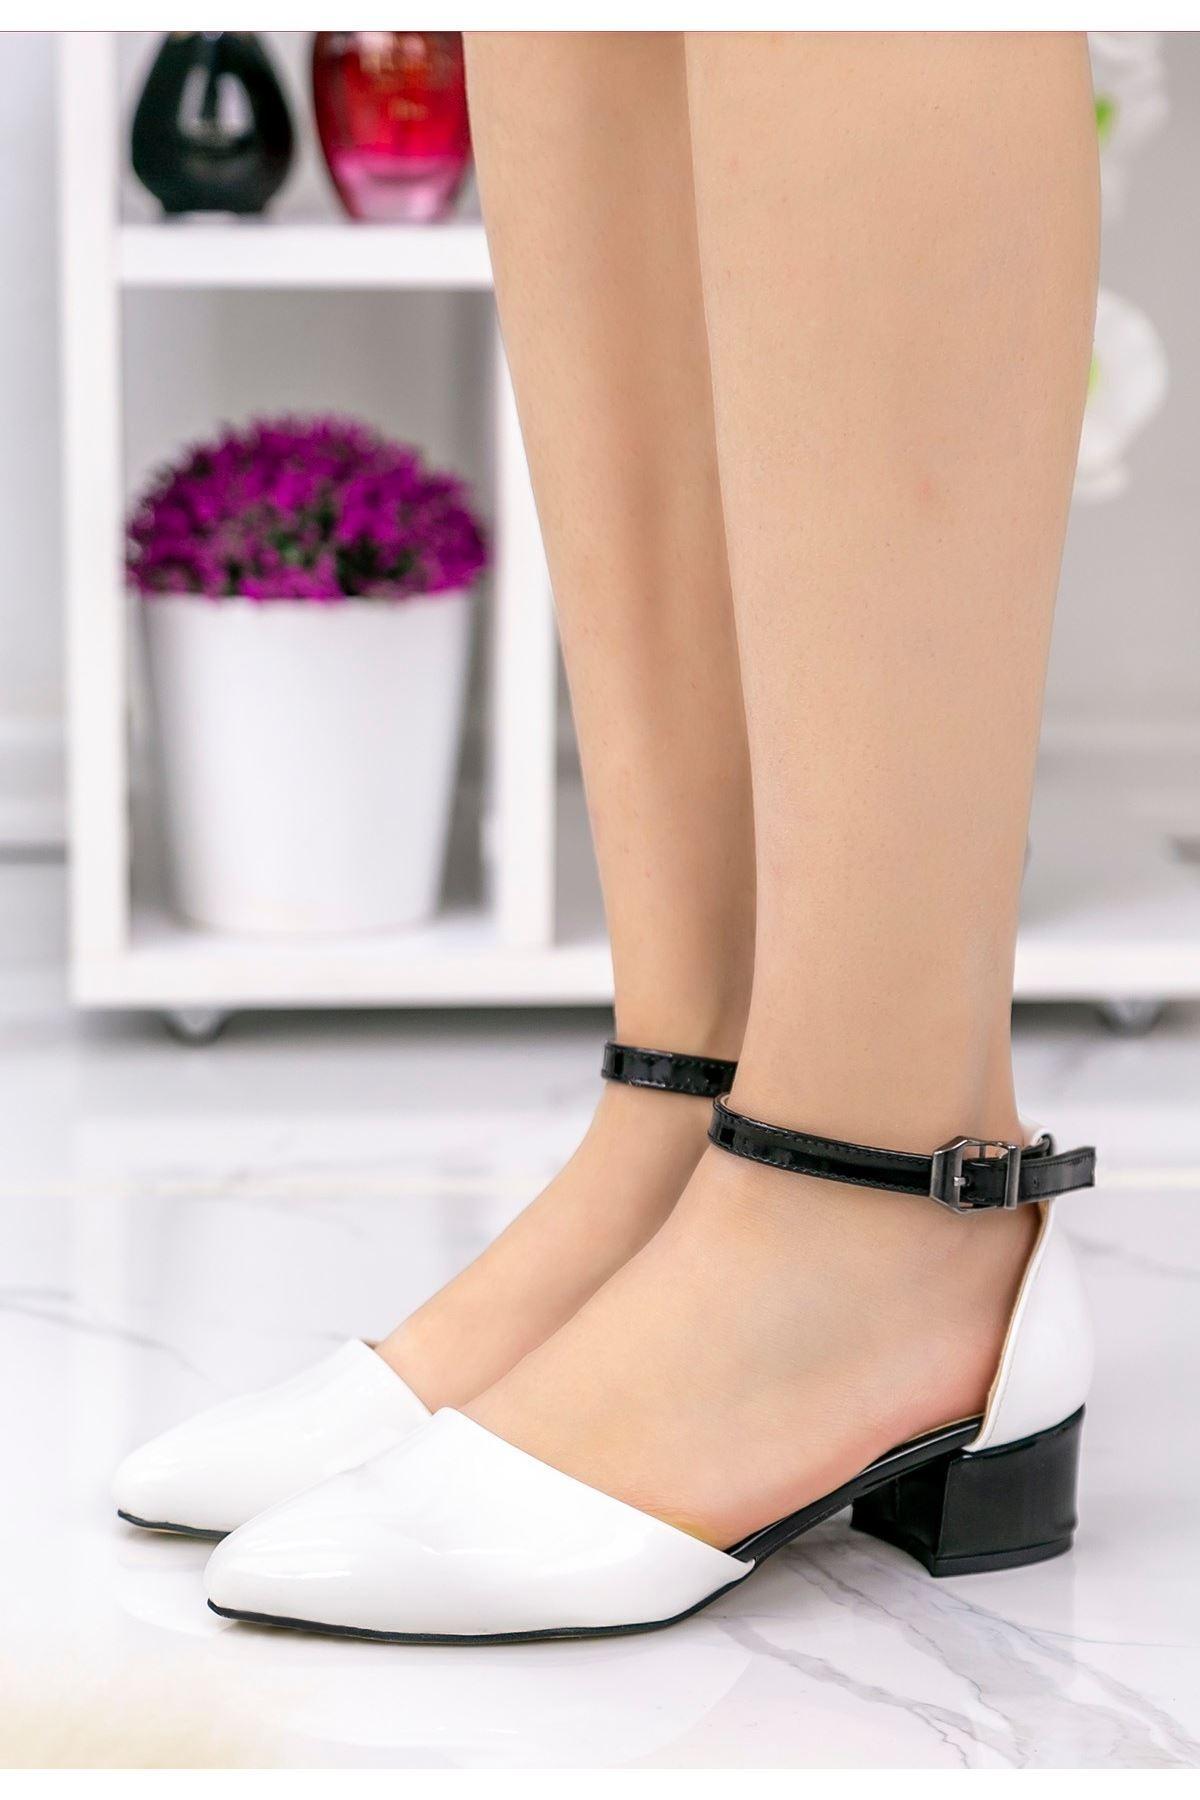 Pavla Beyaz Rugan Siyah Topuklu Ayakkabı